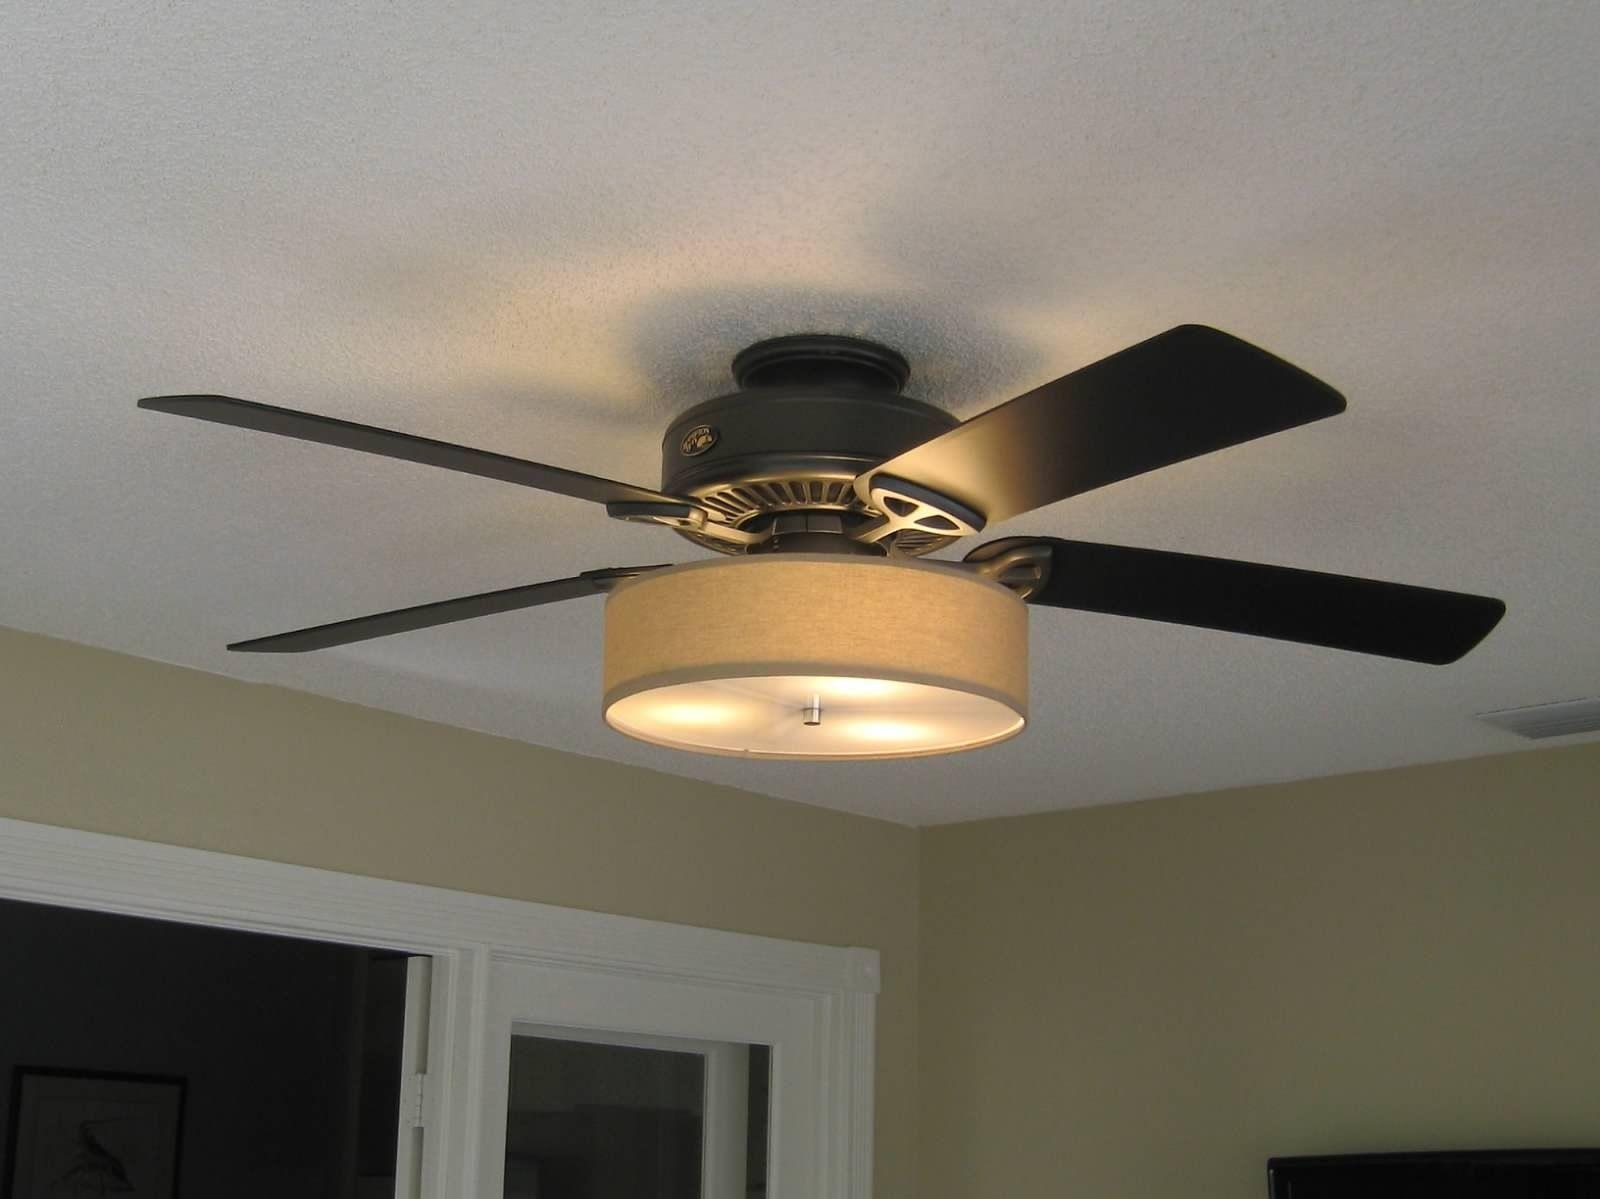 unique ceiling lighting. Murray Feiss Ceiling Fan Light Kit Unique Lighting Q